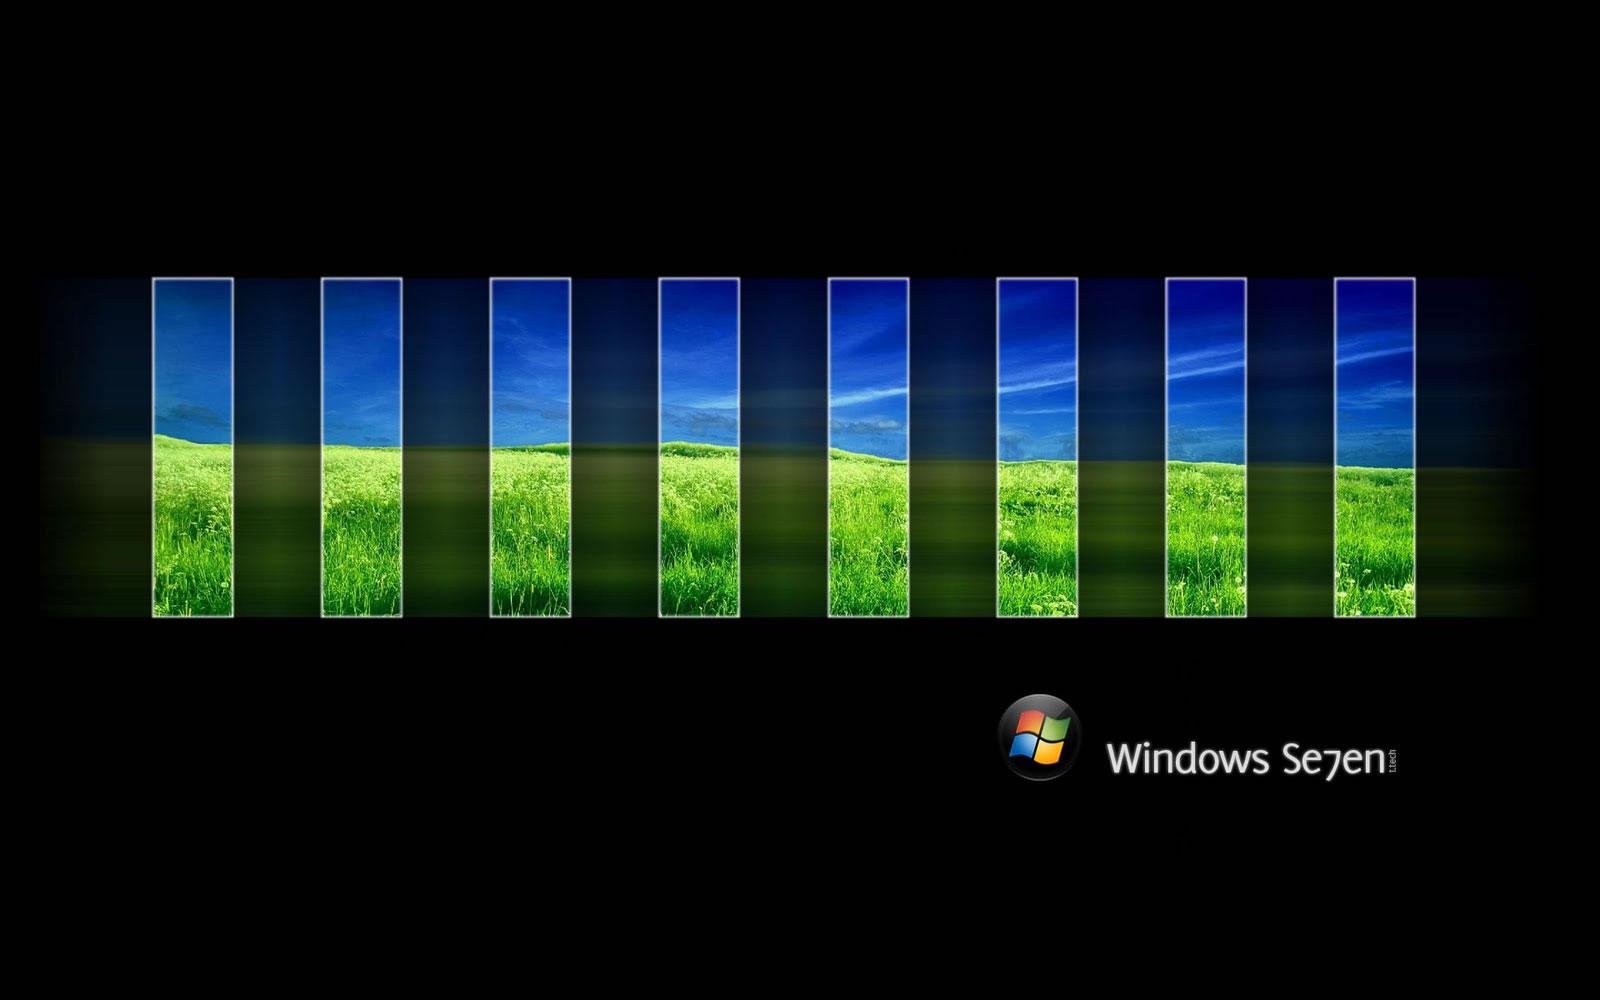 http://1.bp.blogspot.com/-kWwp4mAwOL0/TmO5OHtDjLI/AAAAAAAAATg/bEsHyA1jjBE/s1600/latest-windows-7-hd-wallpapers-realagressive-3.jpg